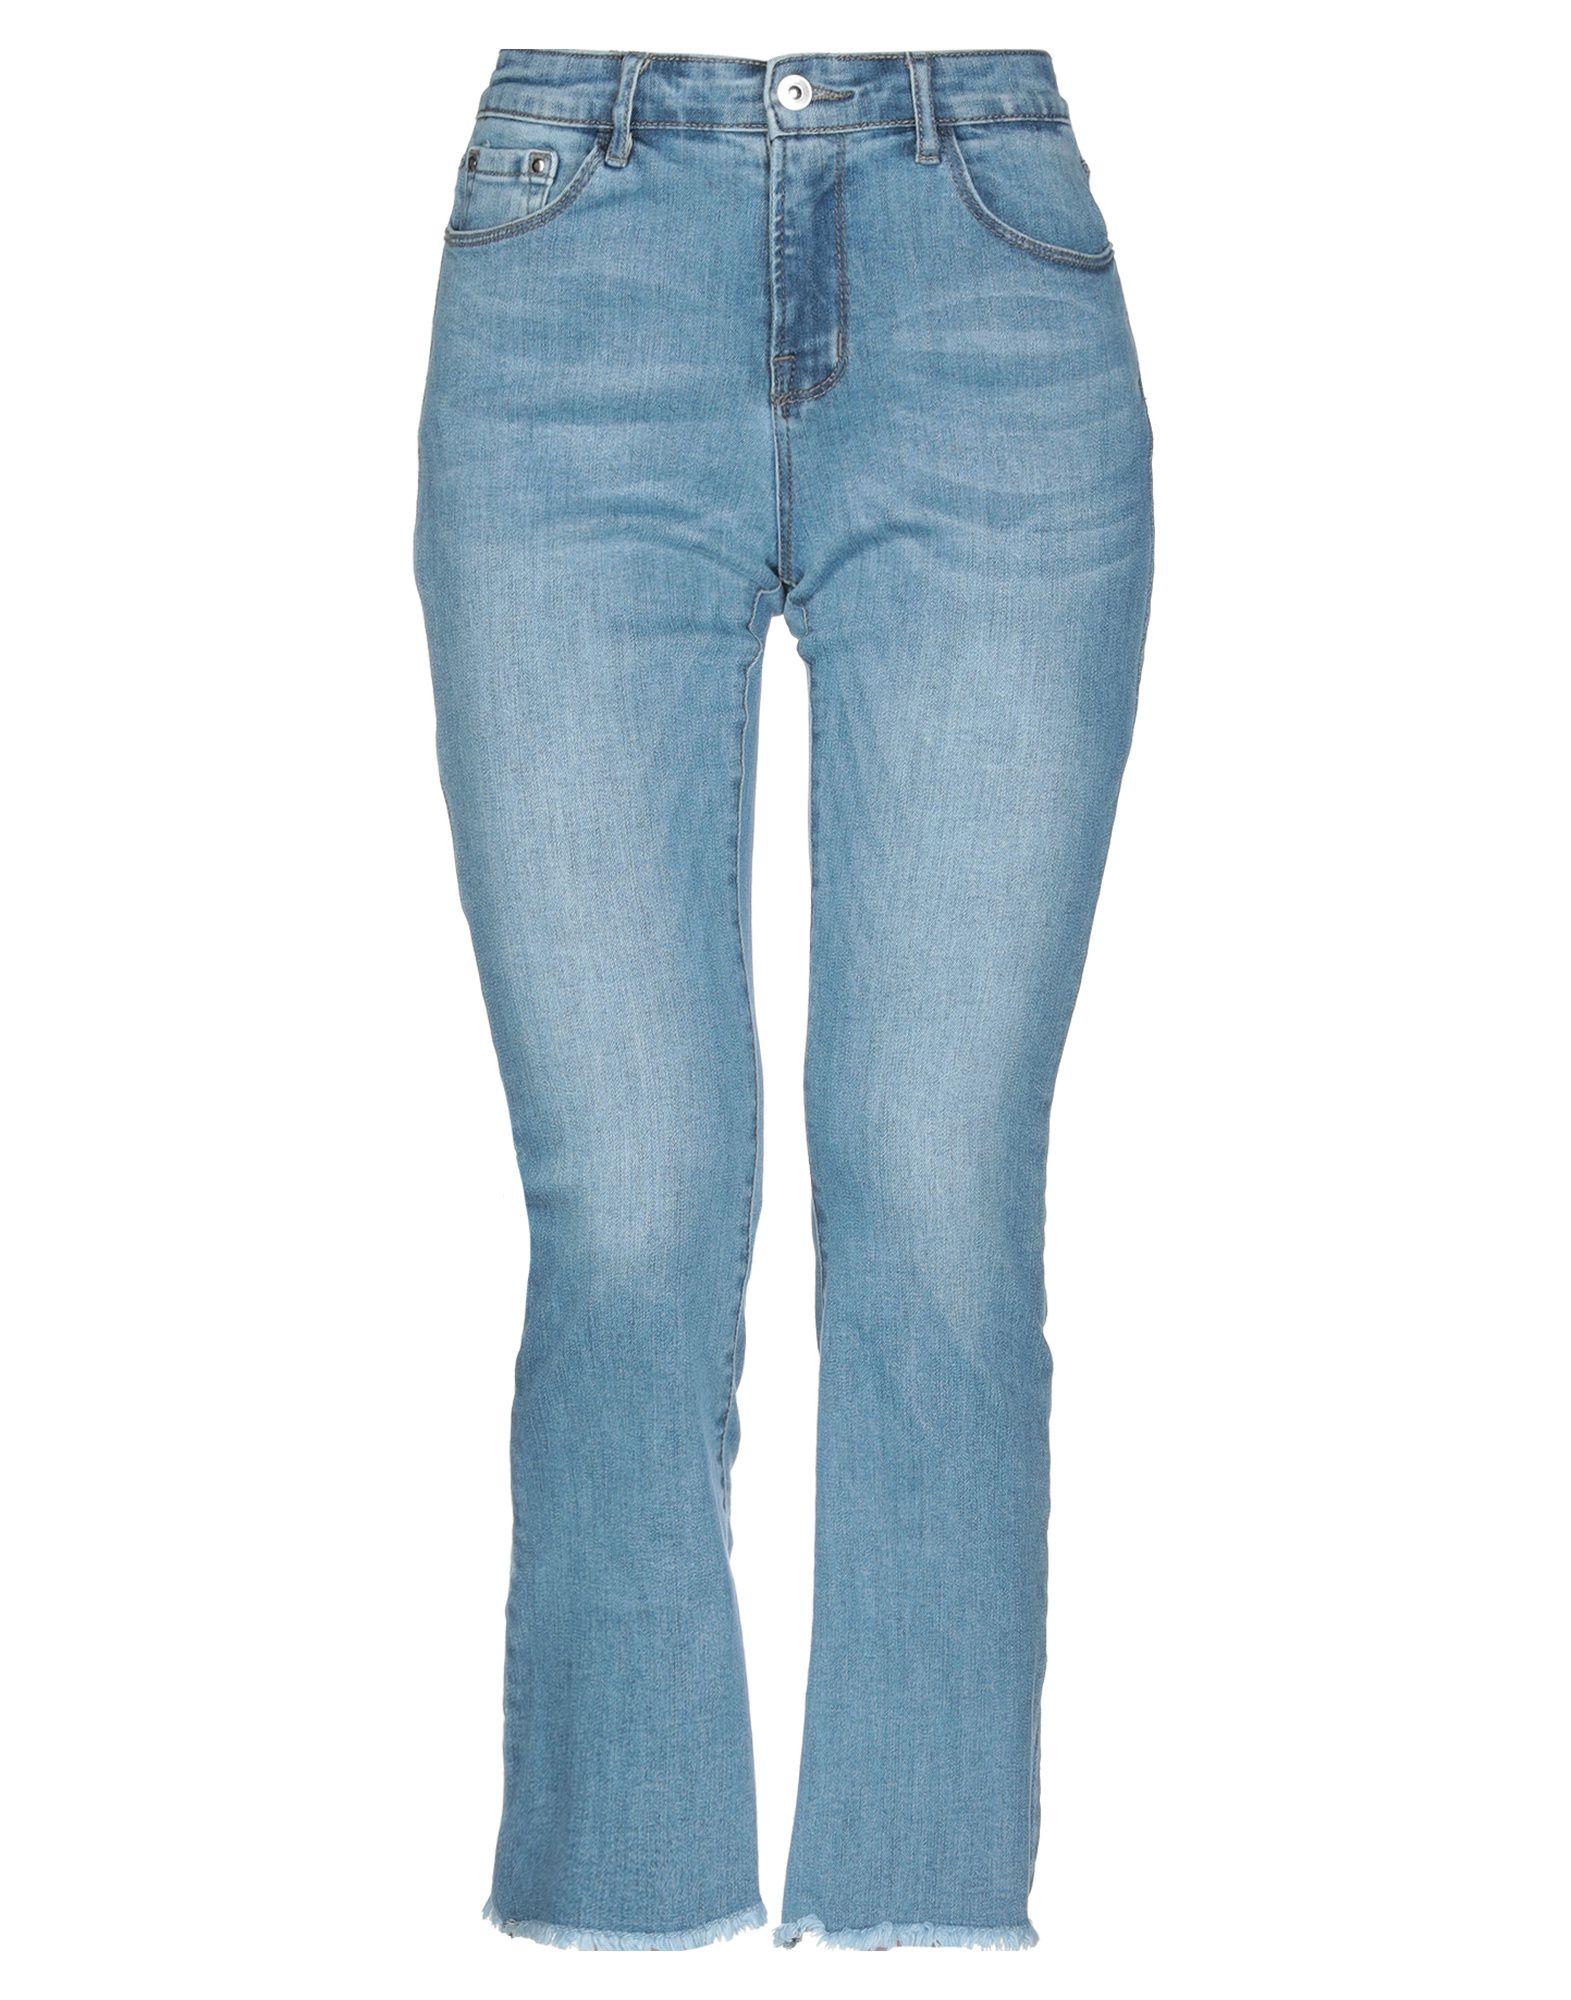 HOPE COLLECTION Джинсовые брюки-капри цена 2017